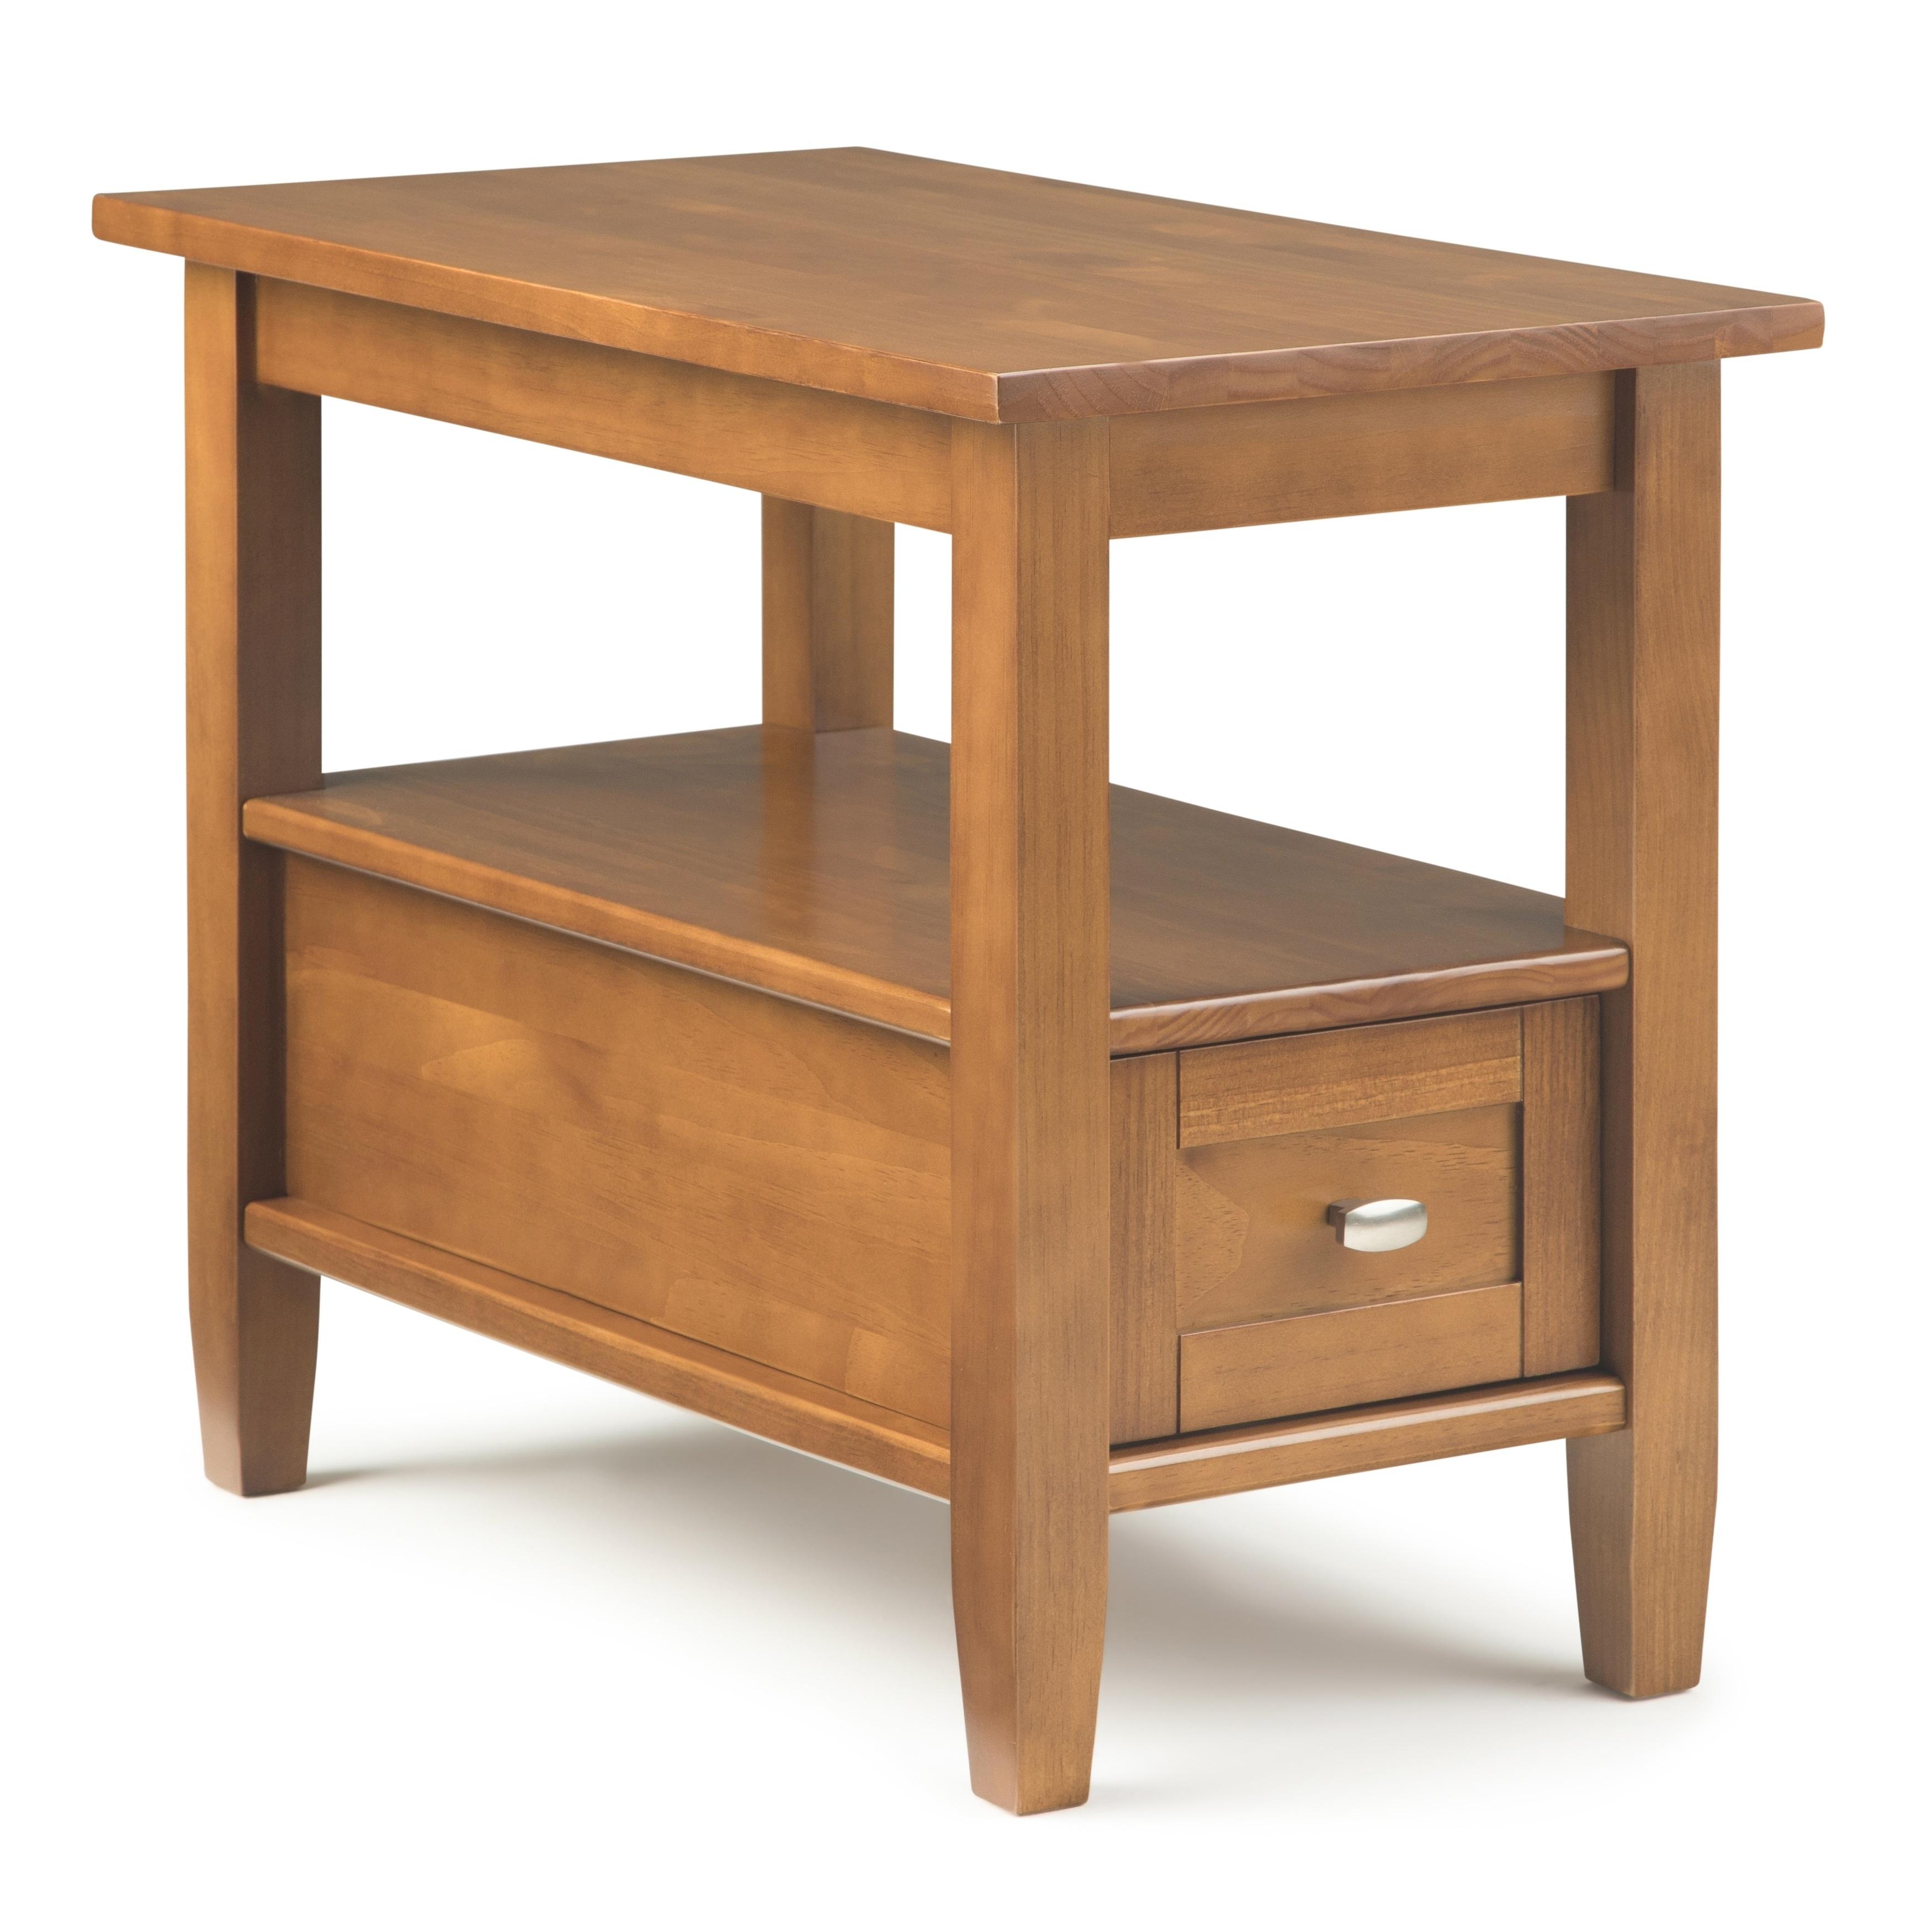 Wyndenhall warm shaker narrow side table